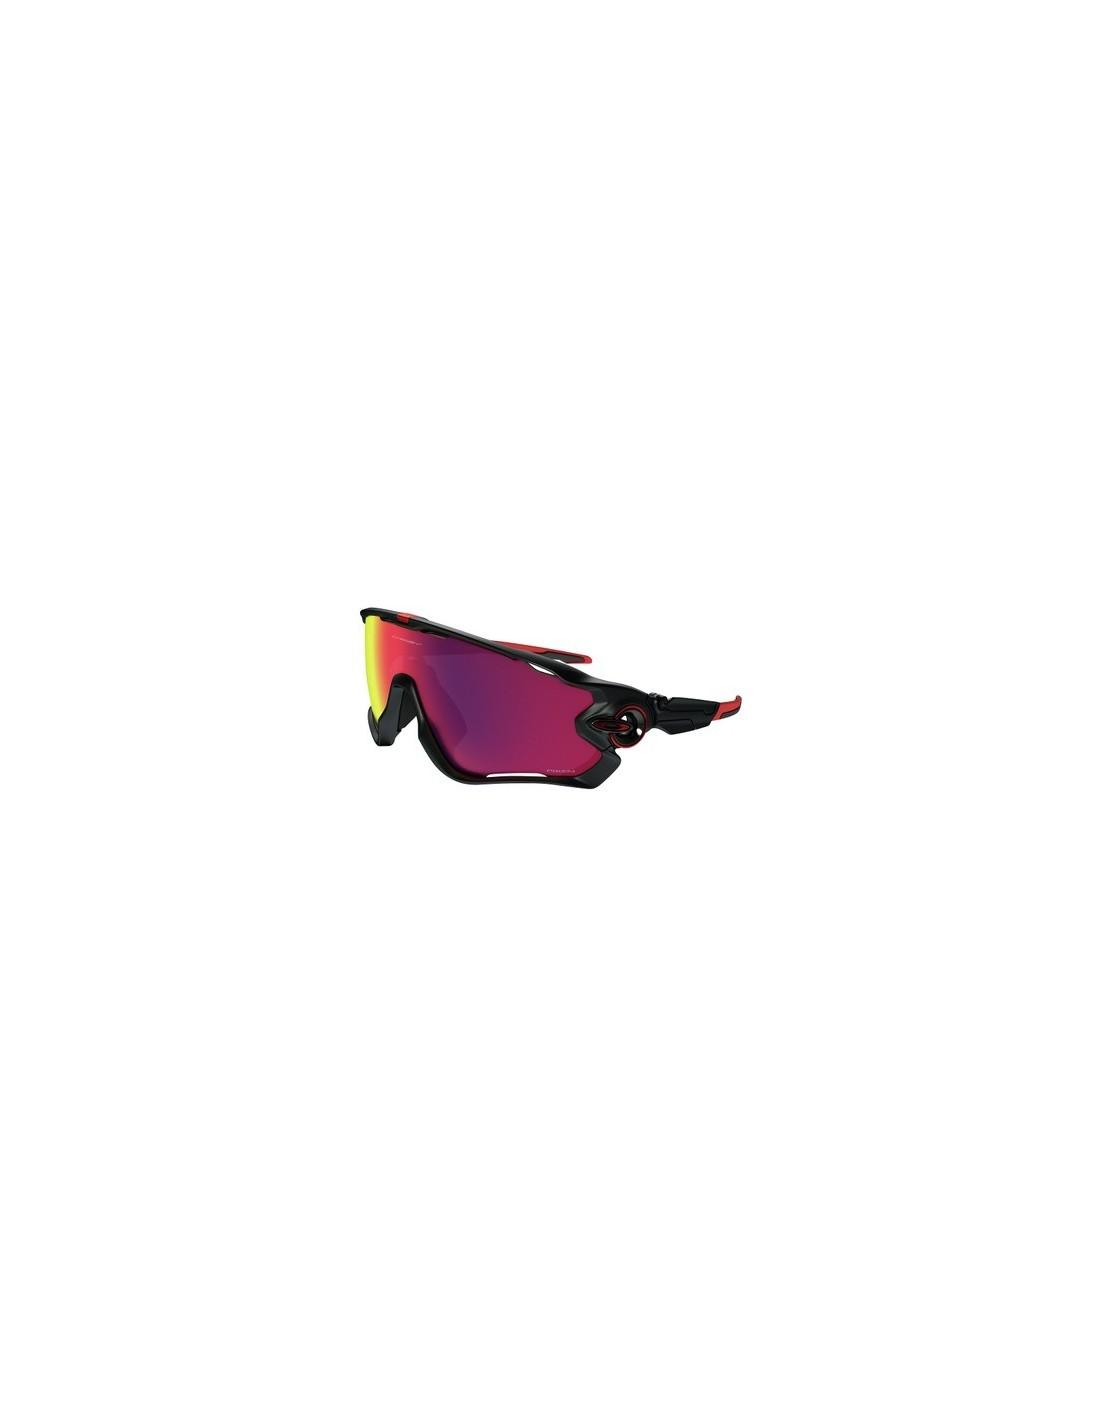 Sykkelbriller Oakley Jawbreaker OO9290 1,999.00